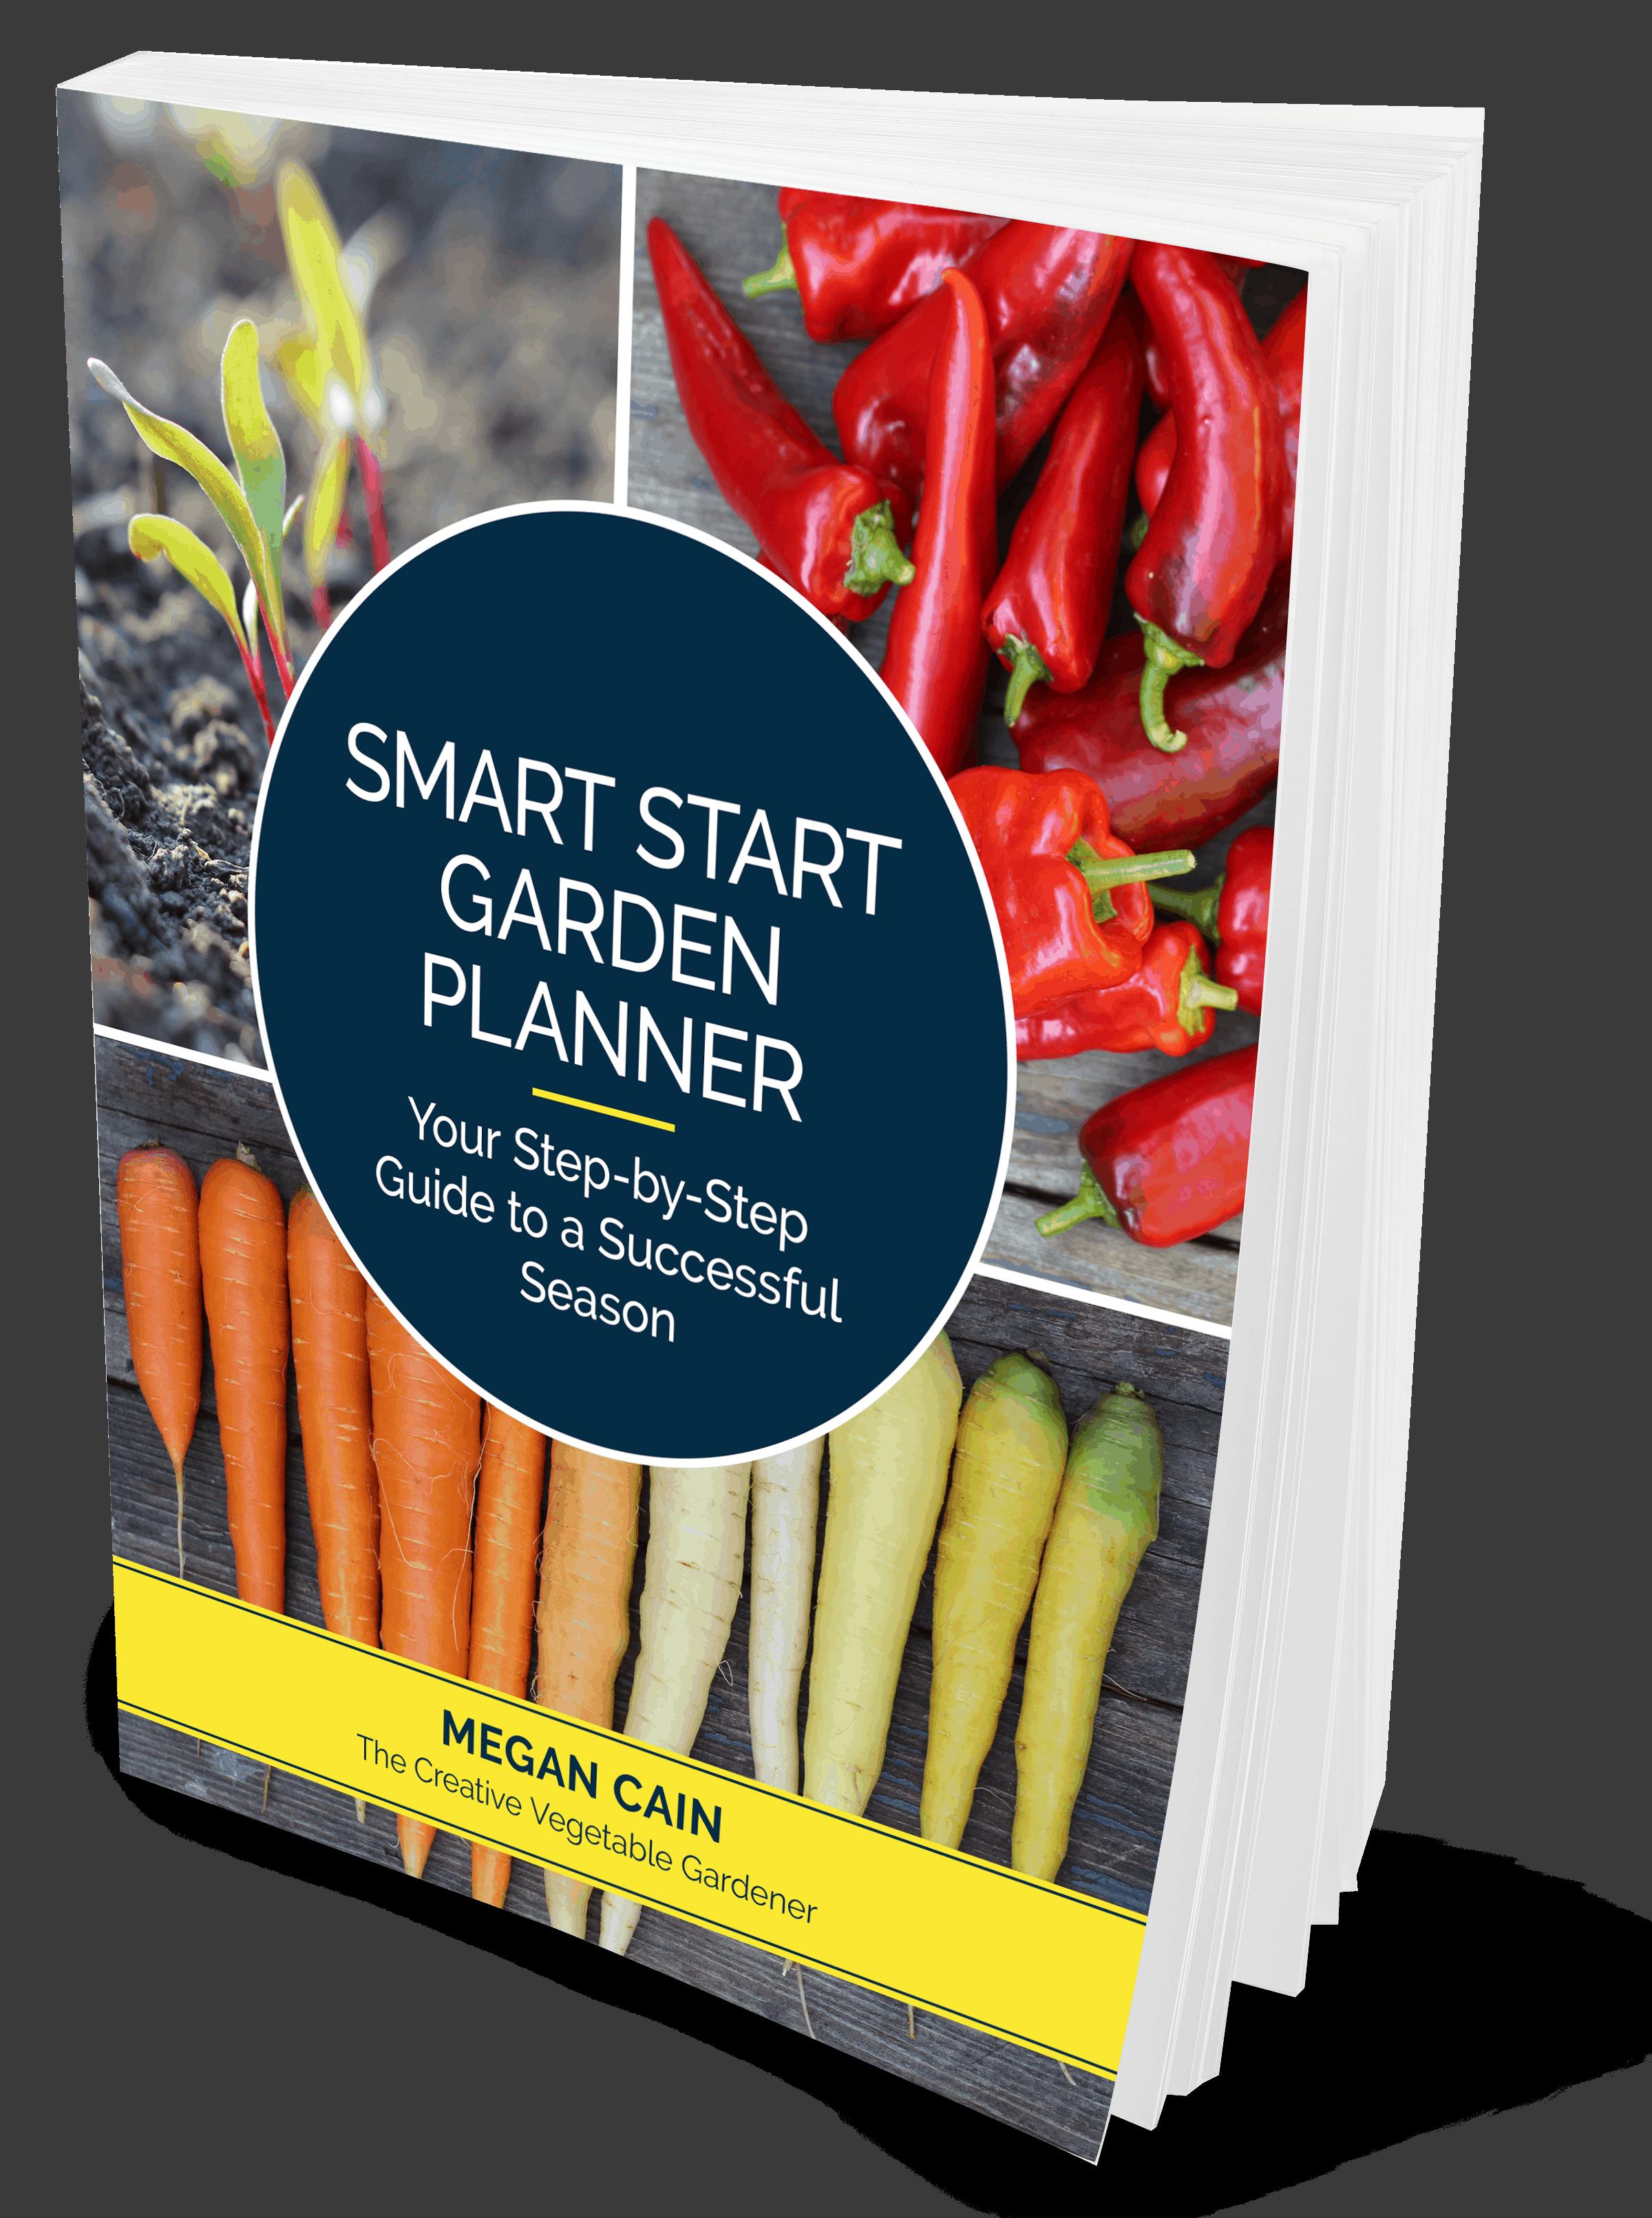 Creative Vegetable Gardener:Smart Start Garden Planner ...